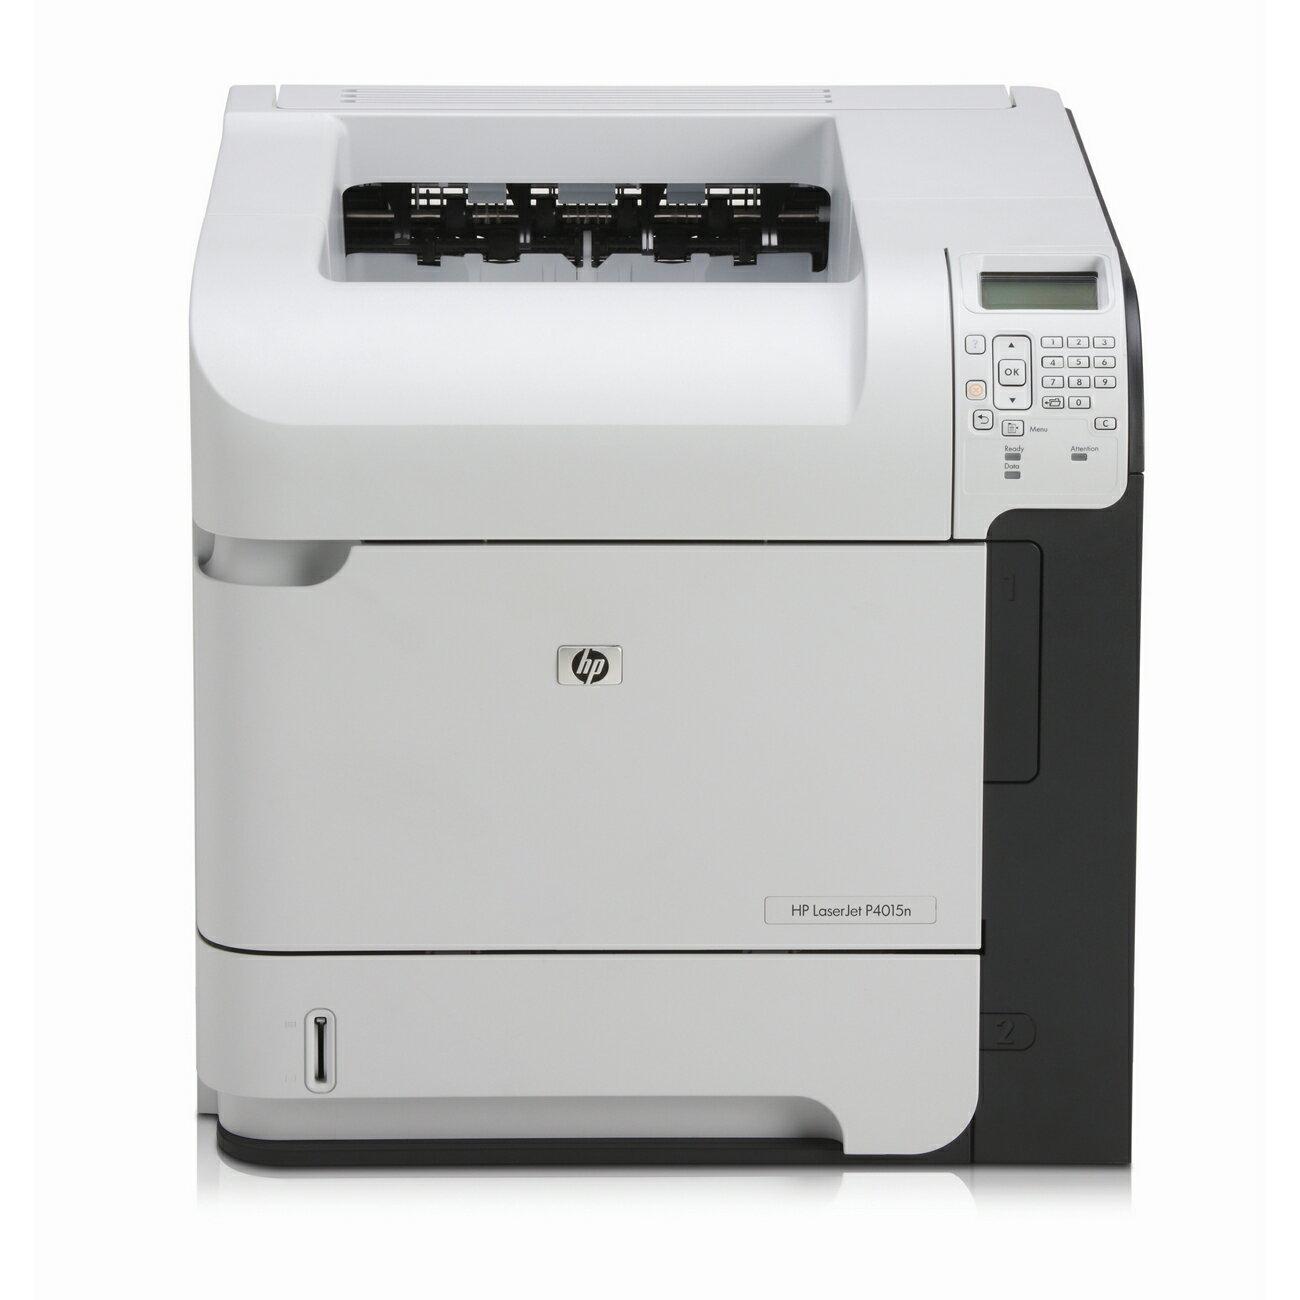 HP LaserJet P4015TN Laser Printer - Monochrome - 1200 x 1200 dpi Print - Plain Paper Print - Desktop - 52 ppm Mono Print - Letter, Legal, Executive, Statement, Com10 Envelope, Monarch Envelope, Custom Size - 1100 sheets Standard Input Capacity - 225000 Du 0